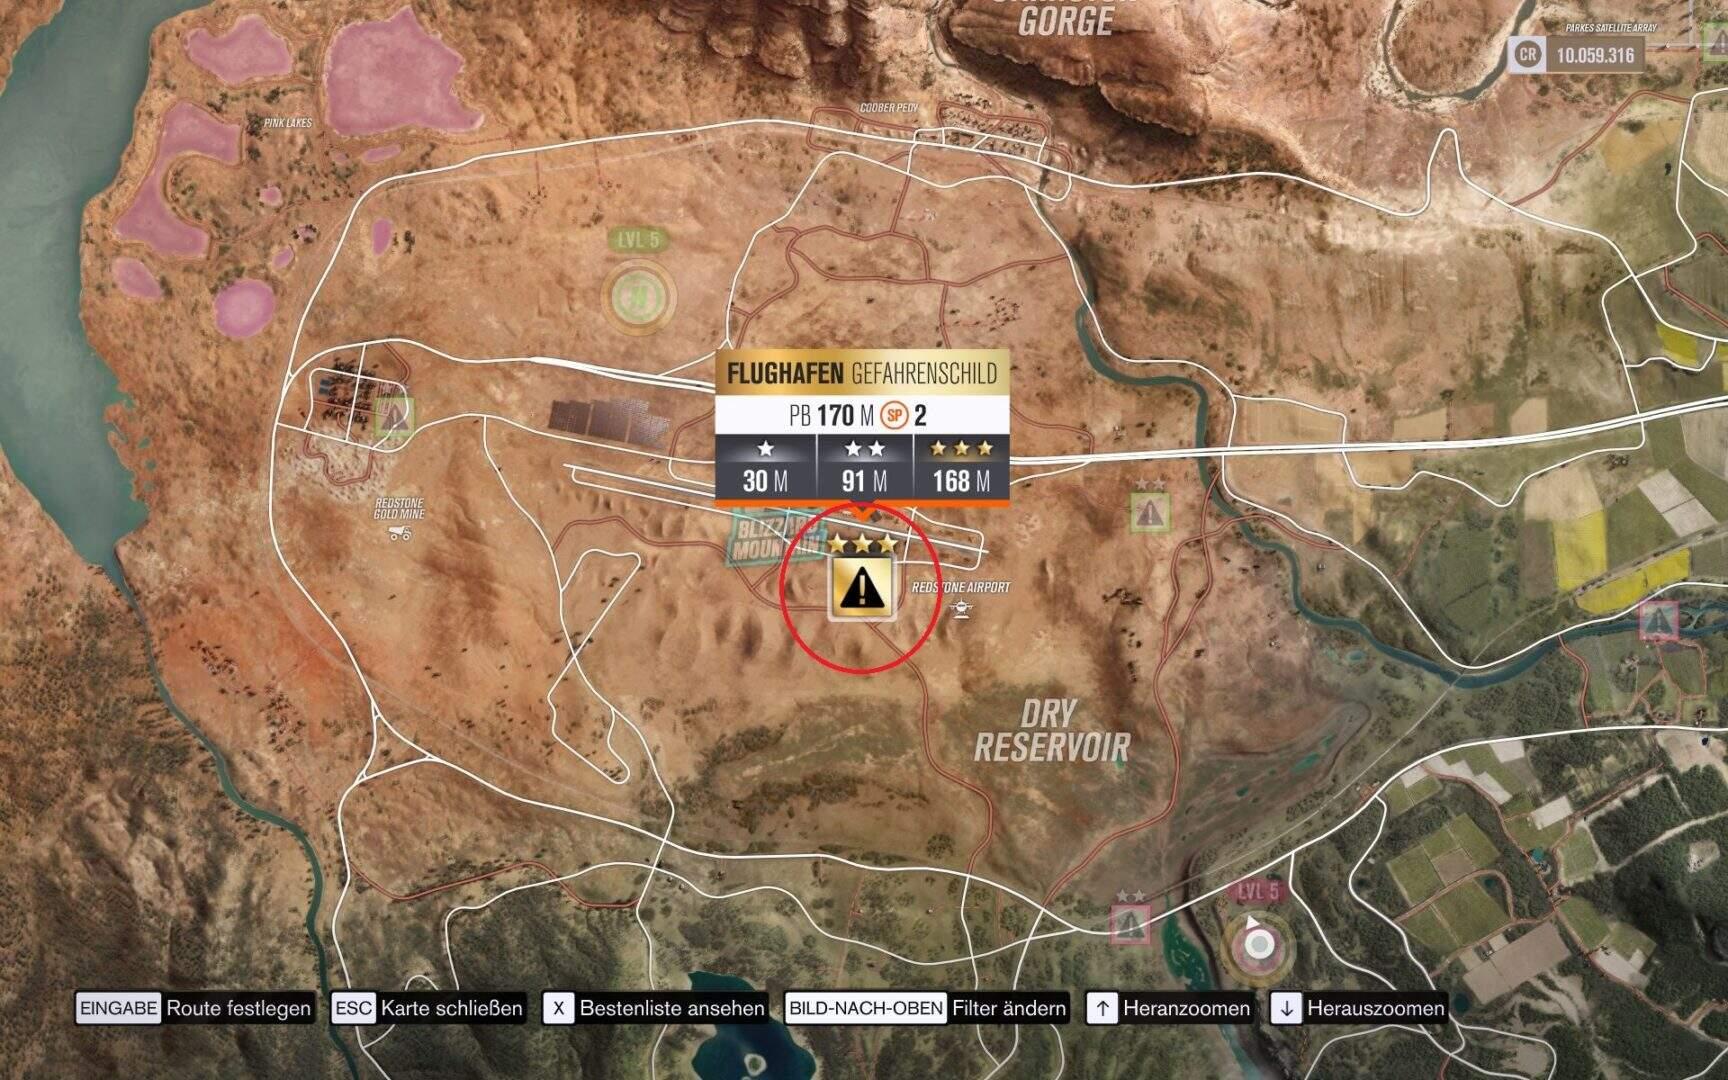 Forza Horizon 3 Fassrolle Spot 1